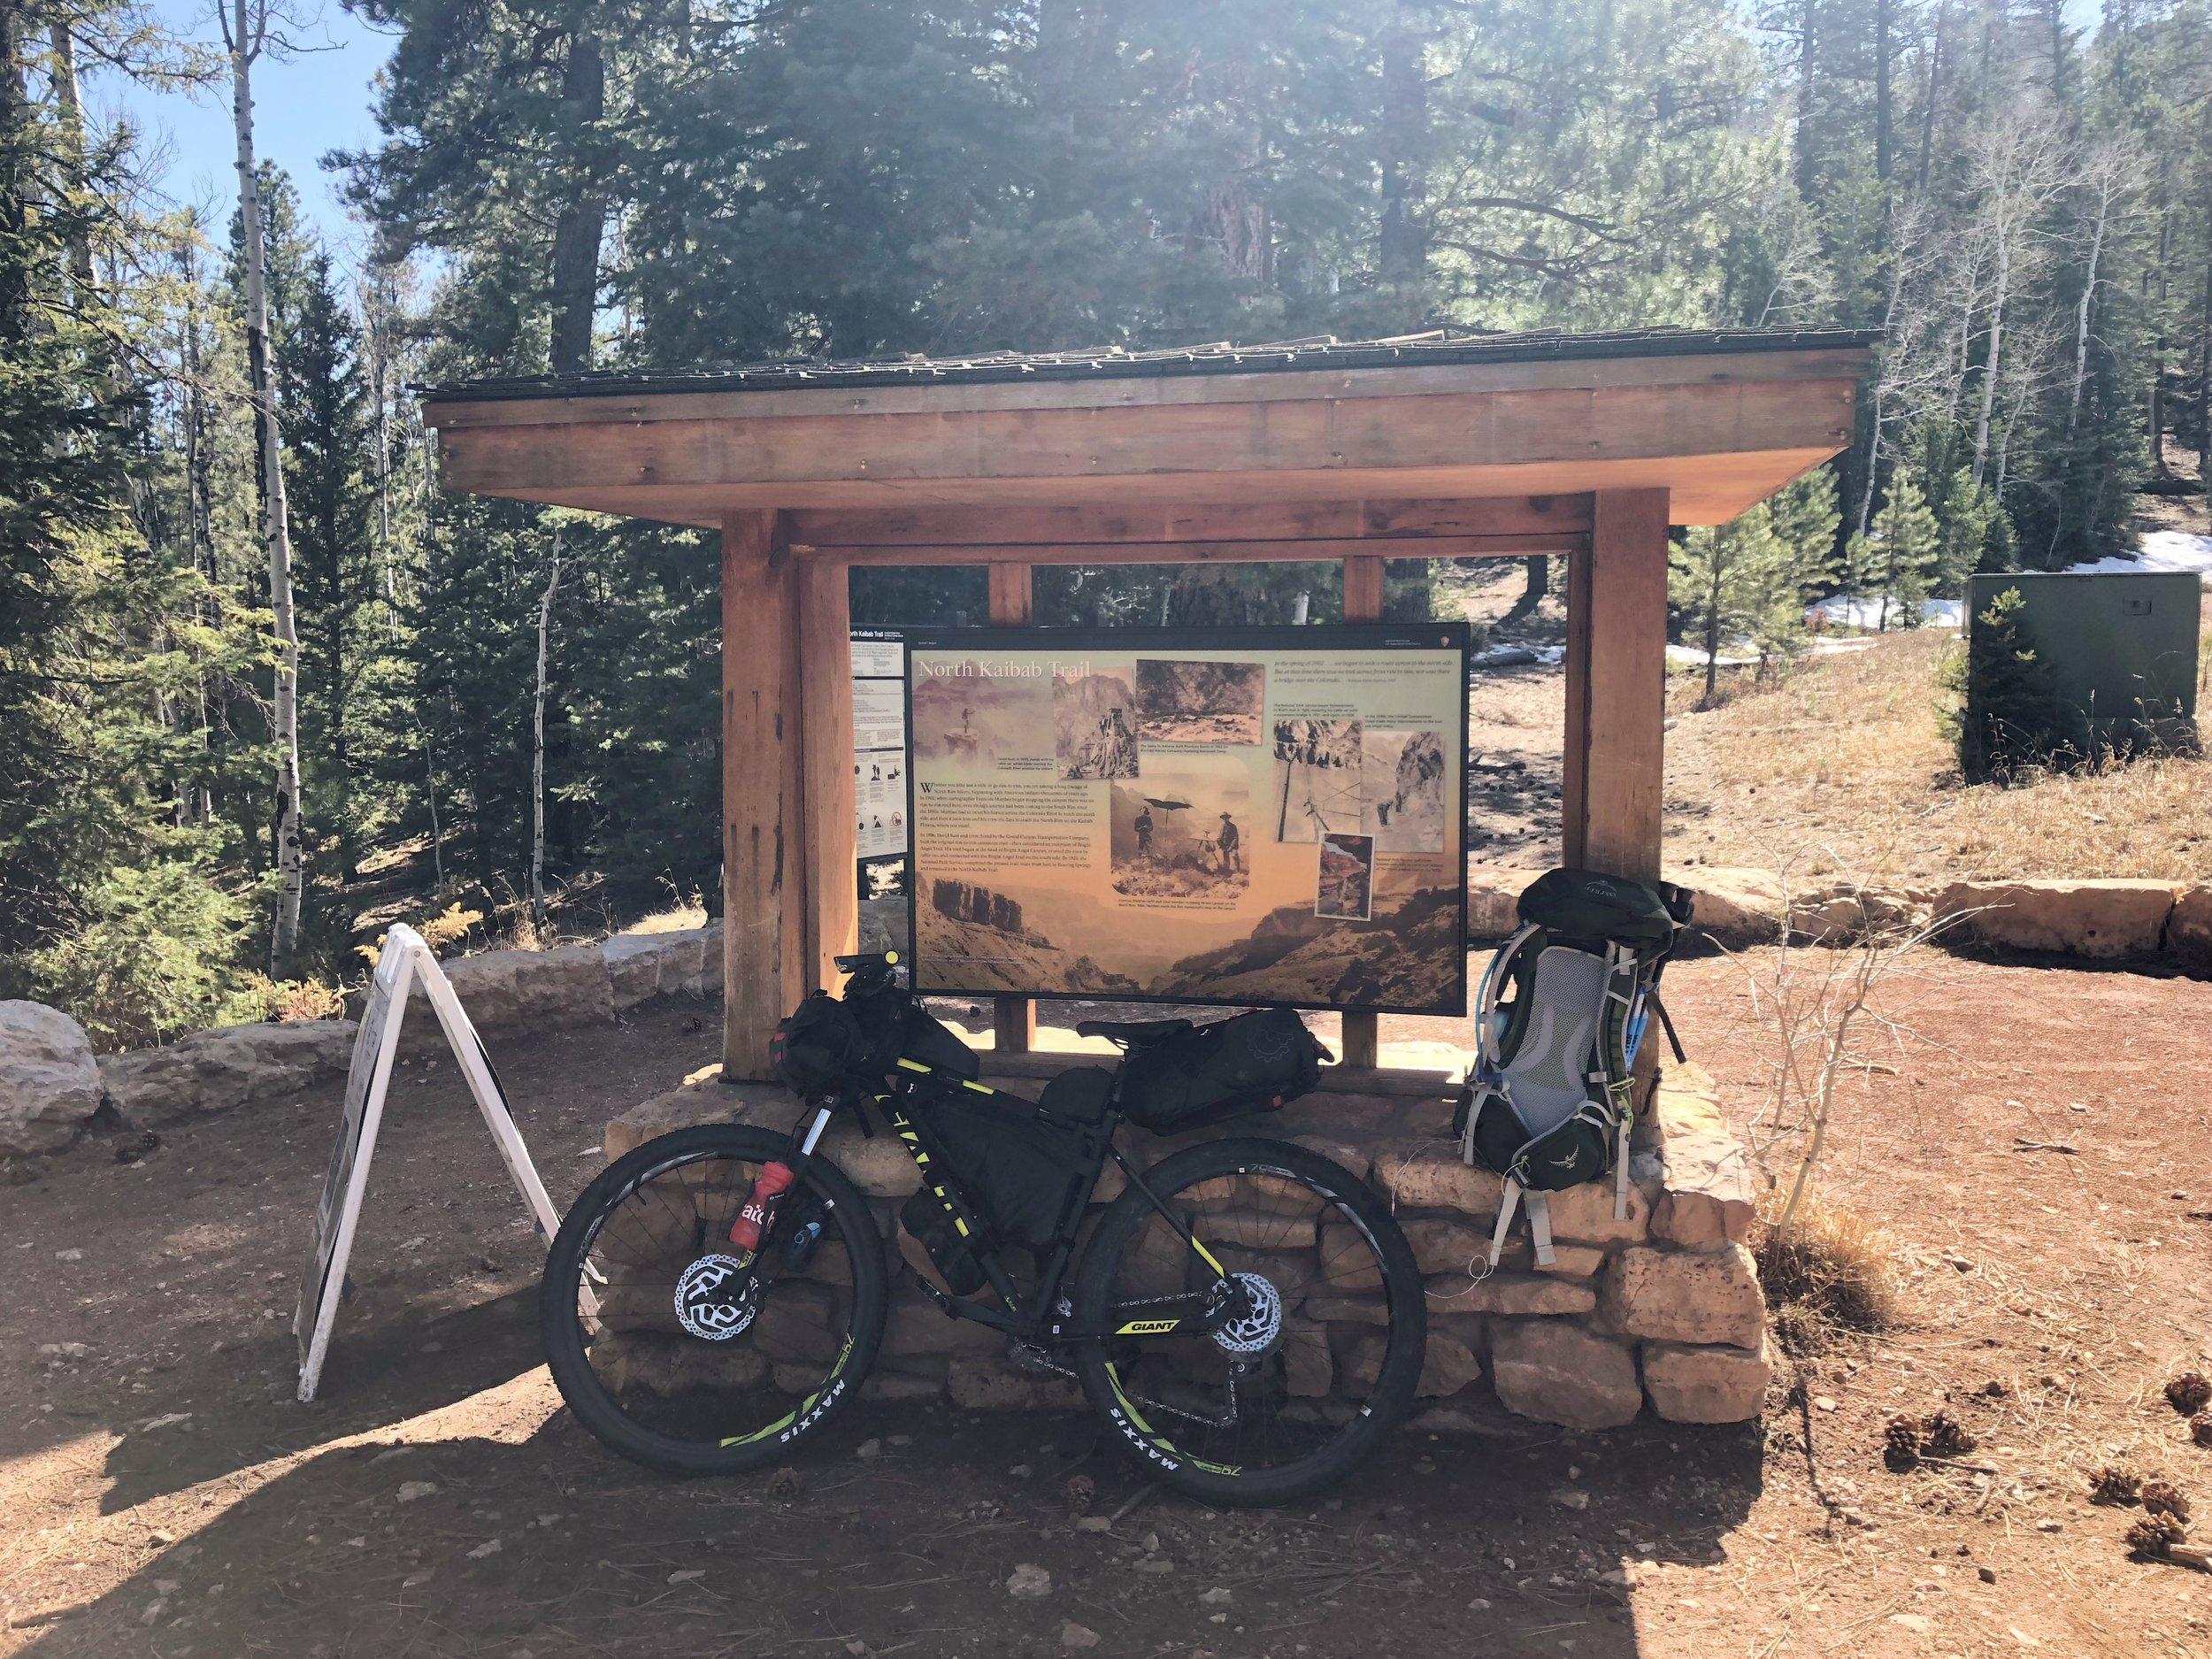 My bike and bag at the North Kaibab Trailhead